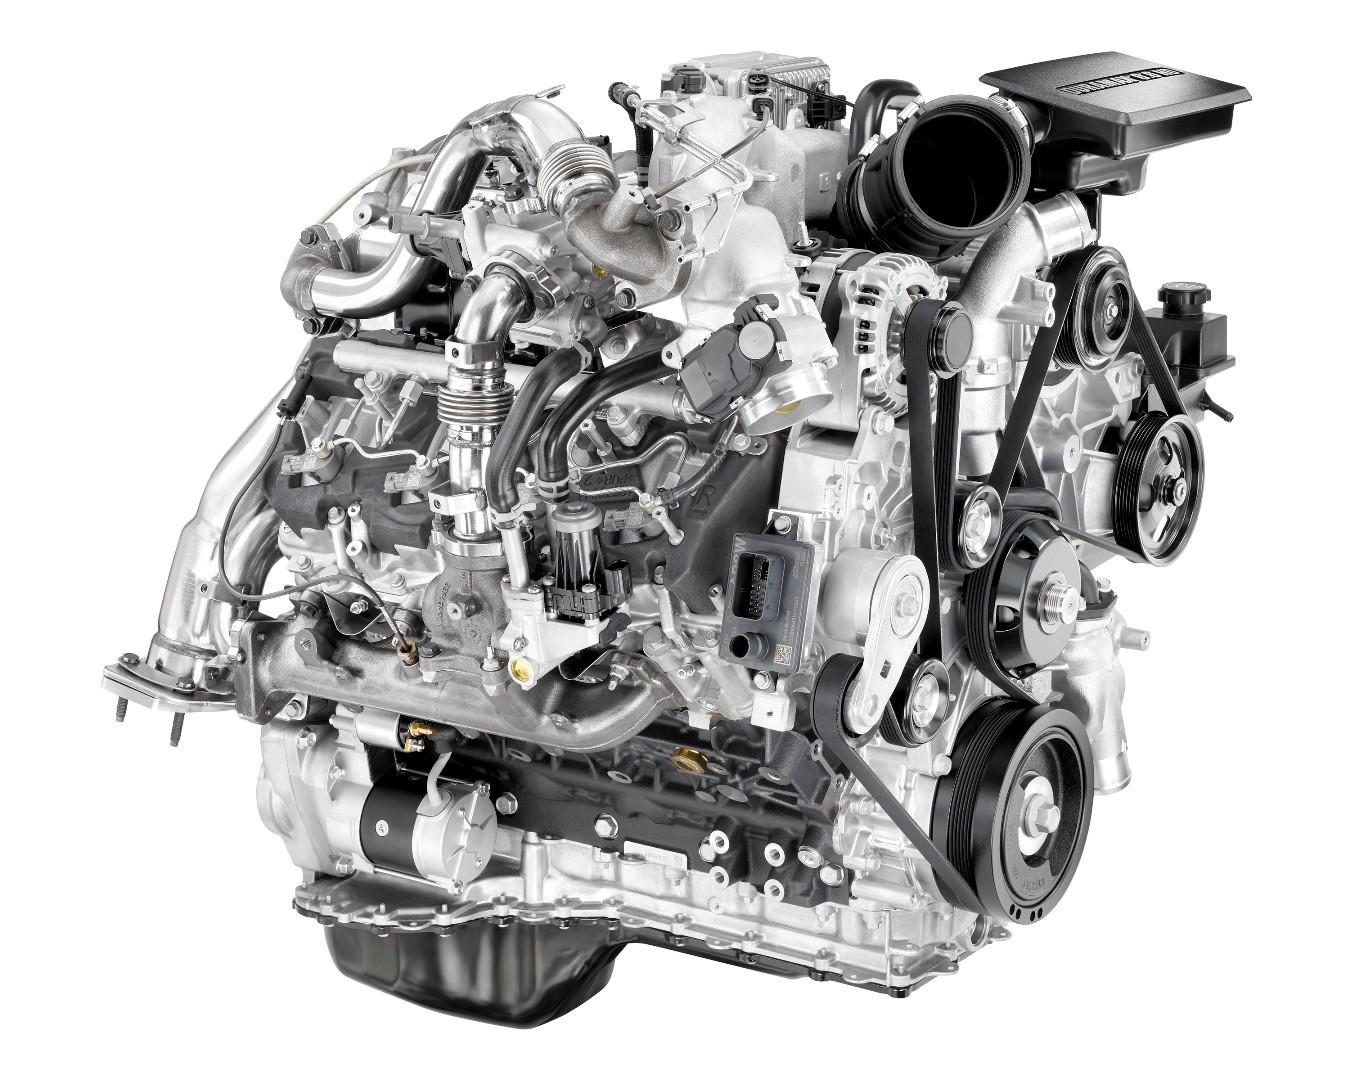 2018 Chevrolet Silverado Hd Vs 2018 Ford F 150 Super Duty Drag Race